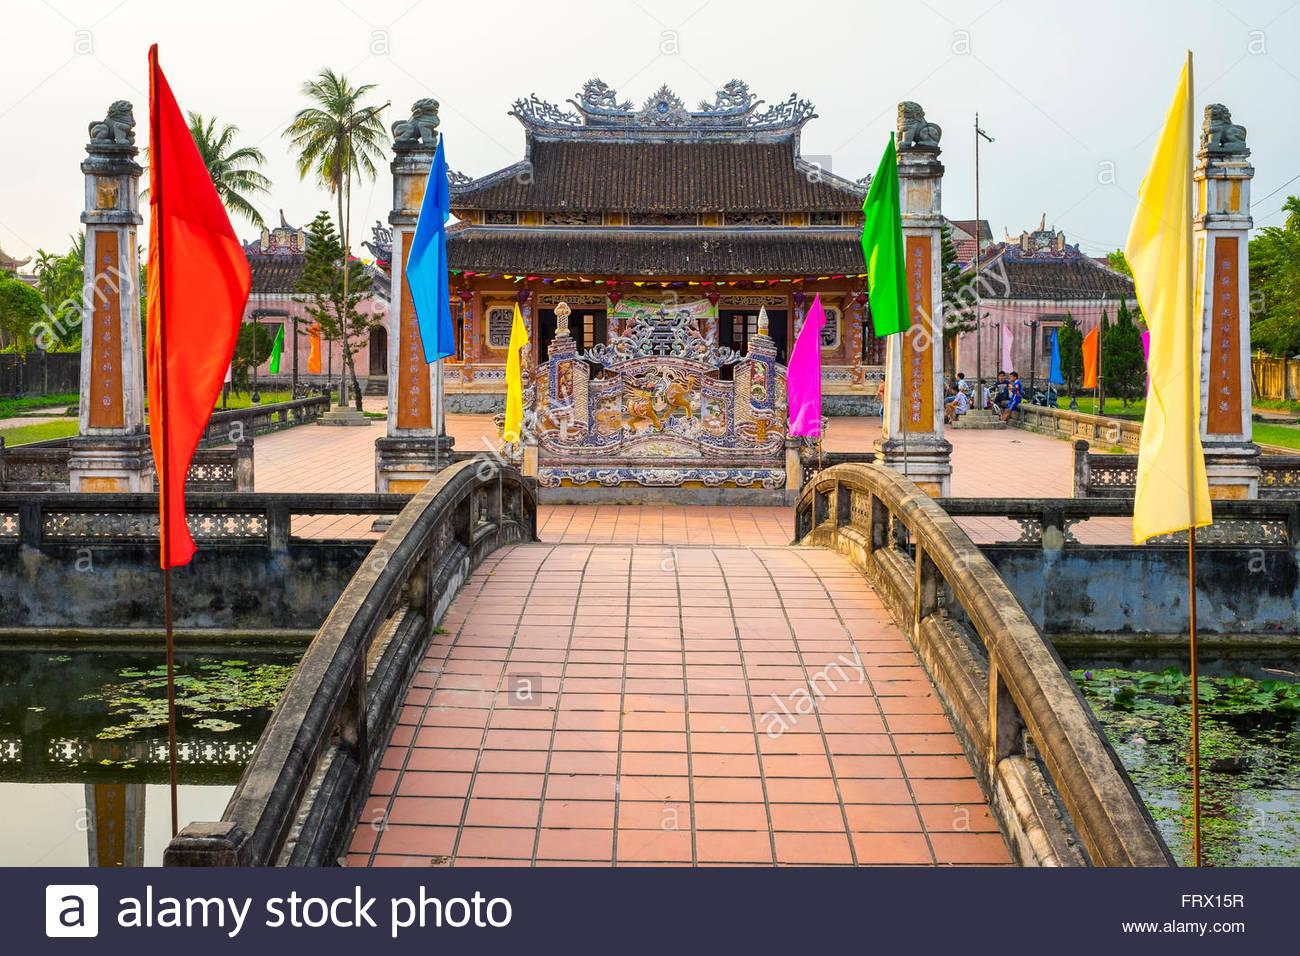 Confucian Temple, Hoi An, Quang Nam Province, Vietnam - Stock Image